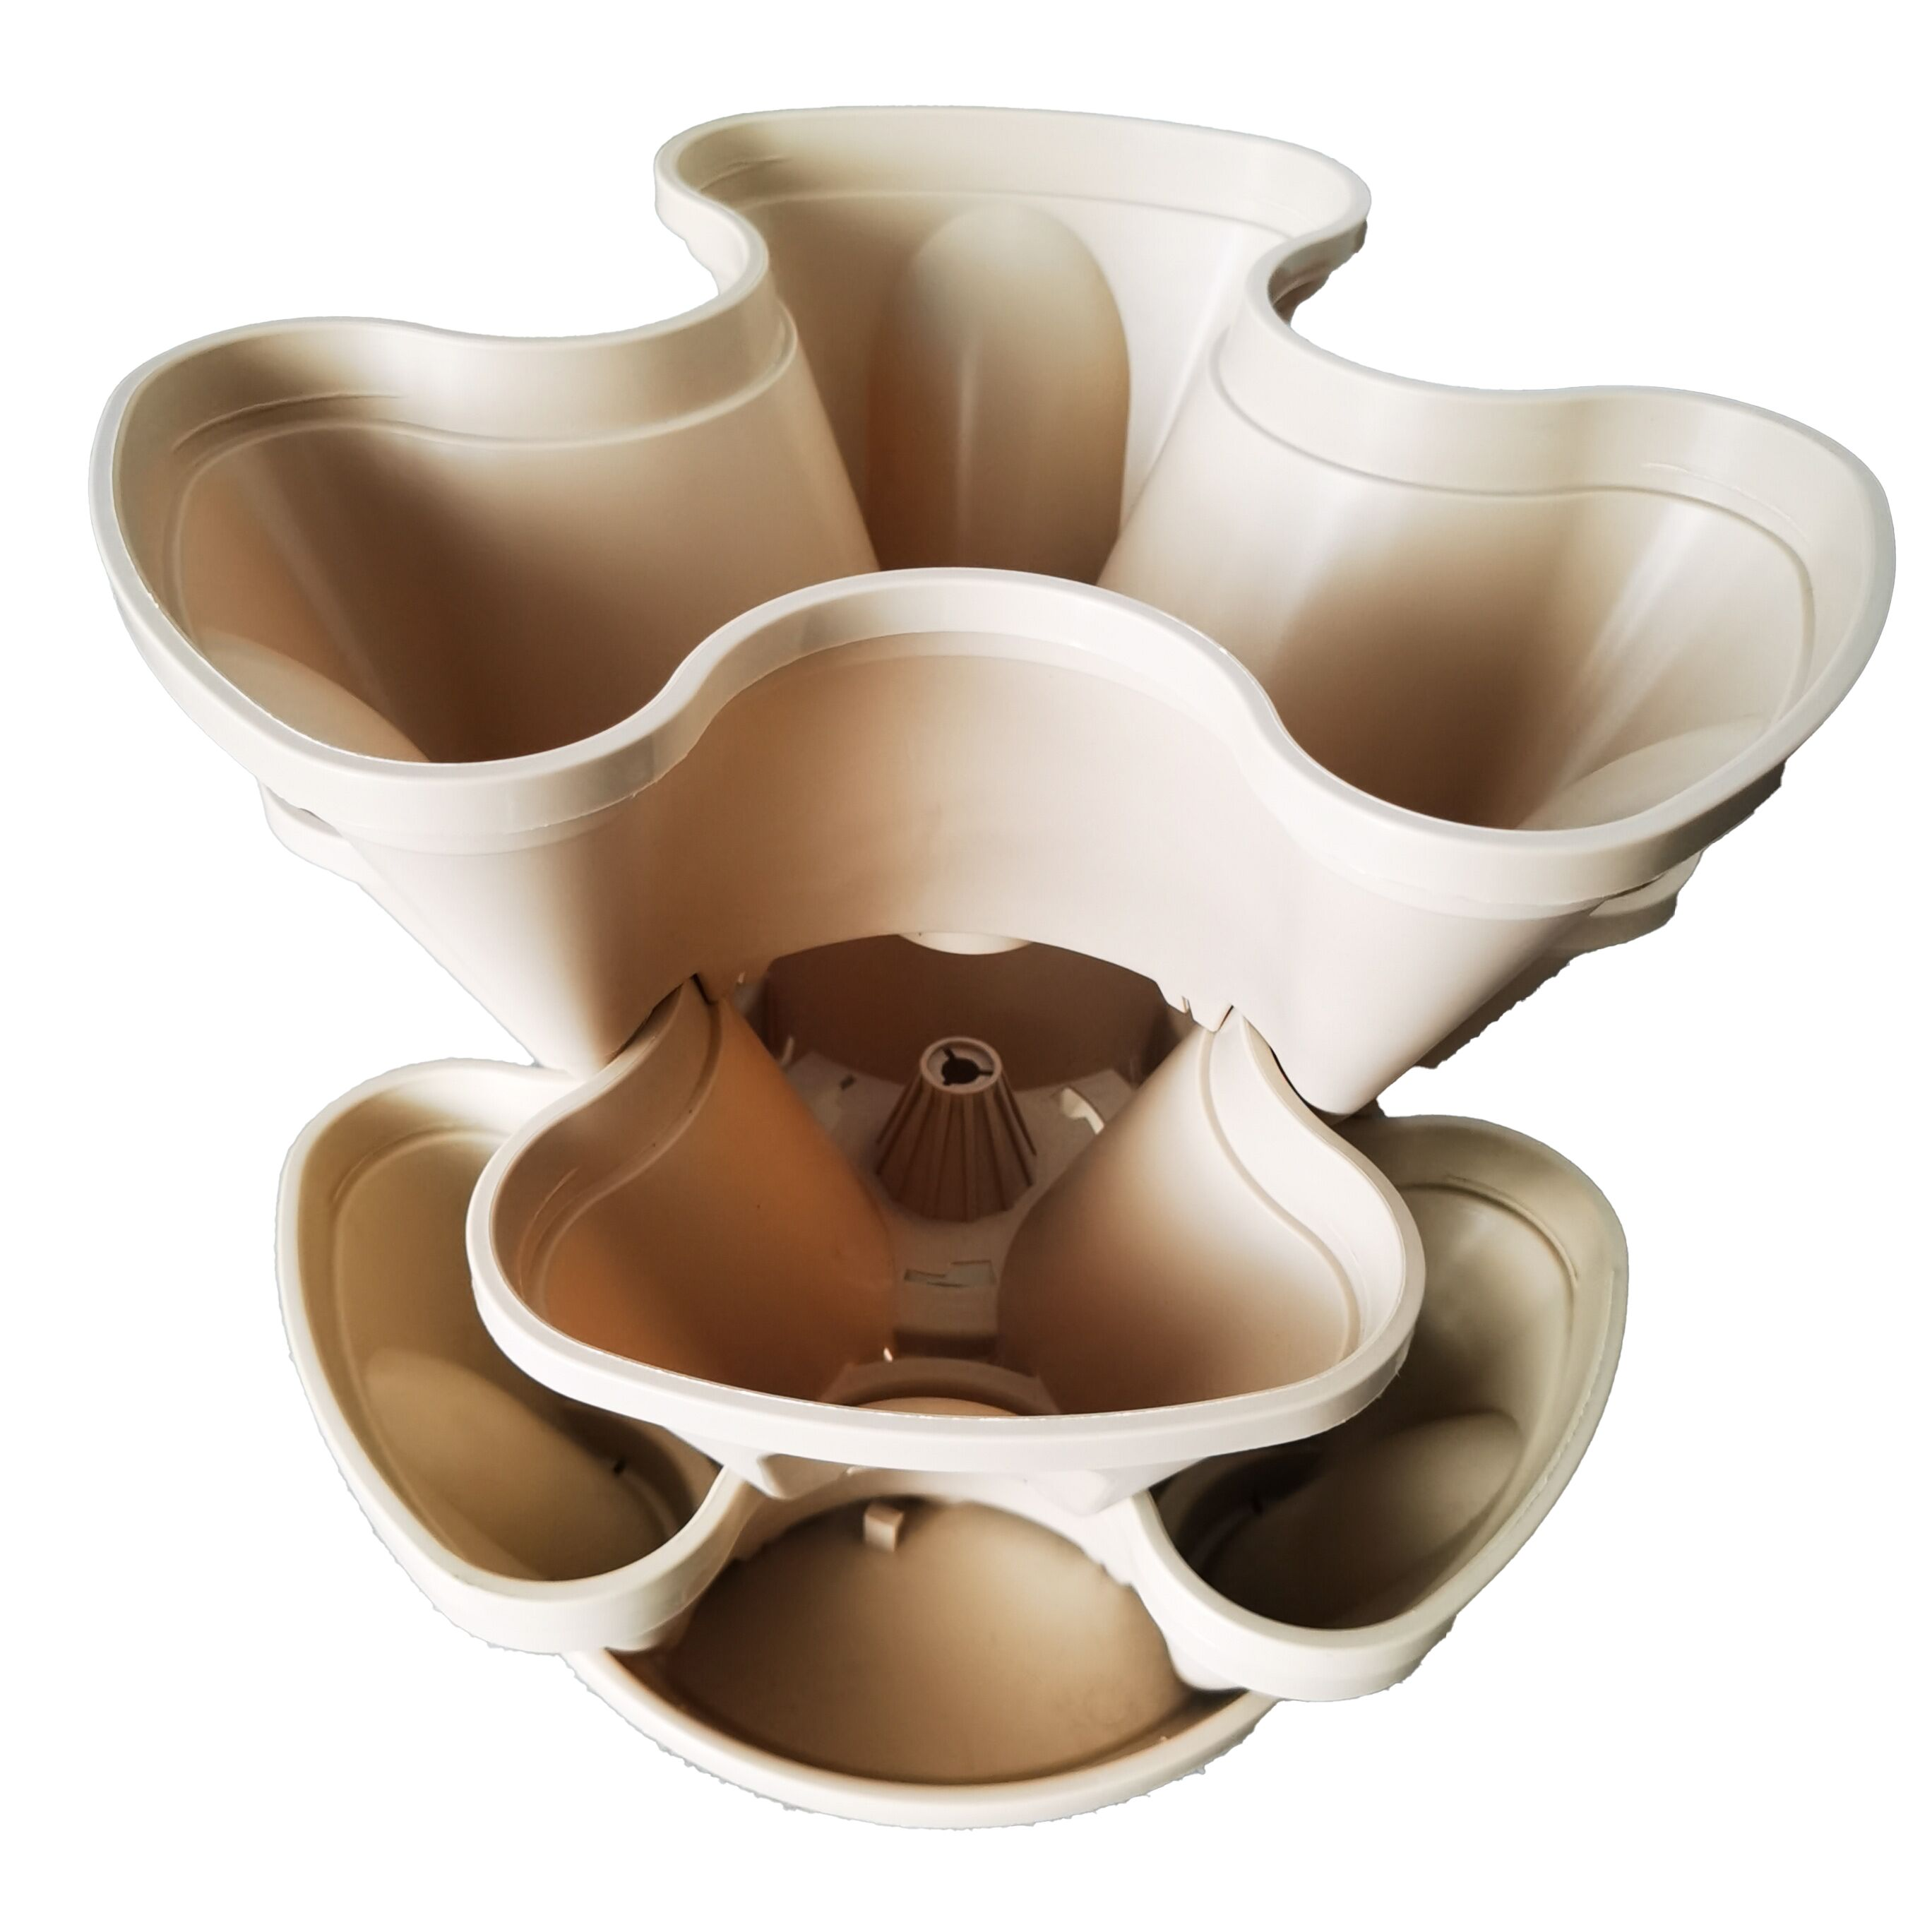 3 Petal Stacking Pot For Indoor Gardening Featured Image